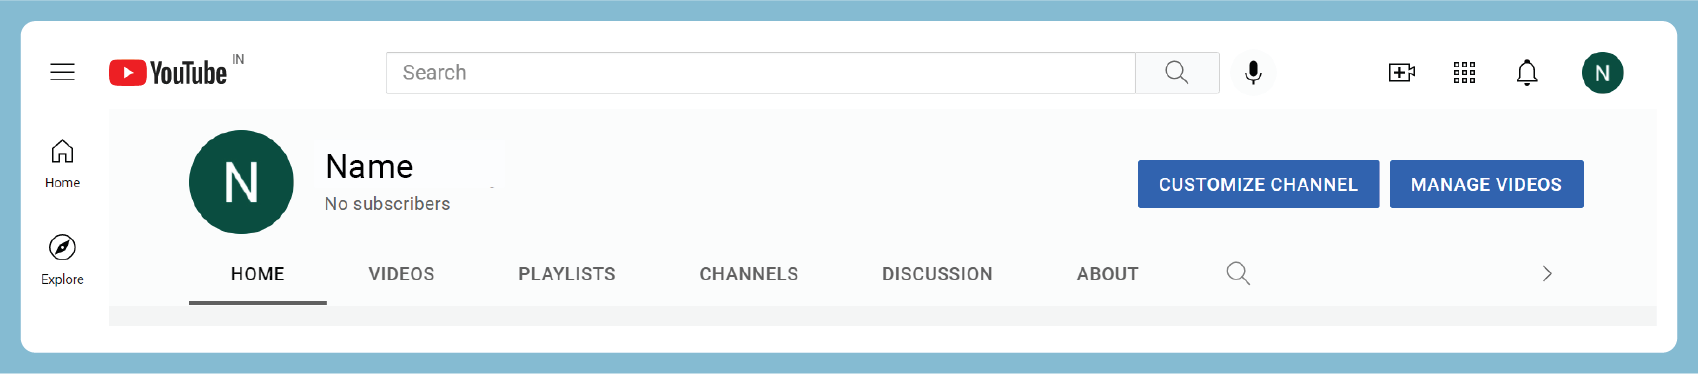 Customizin the YouTube channel